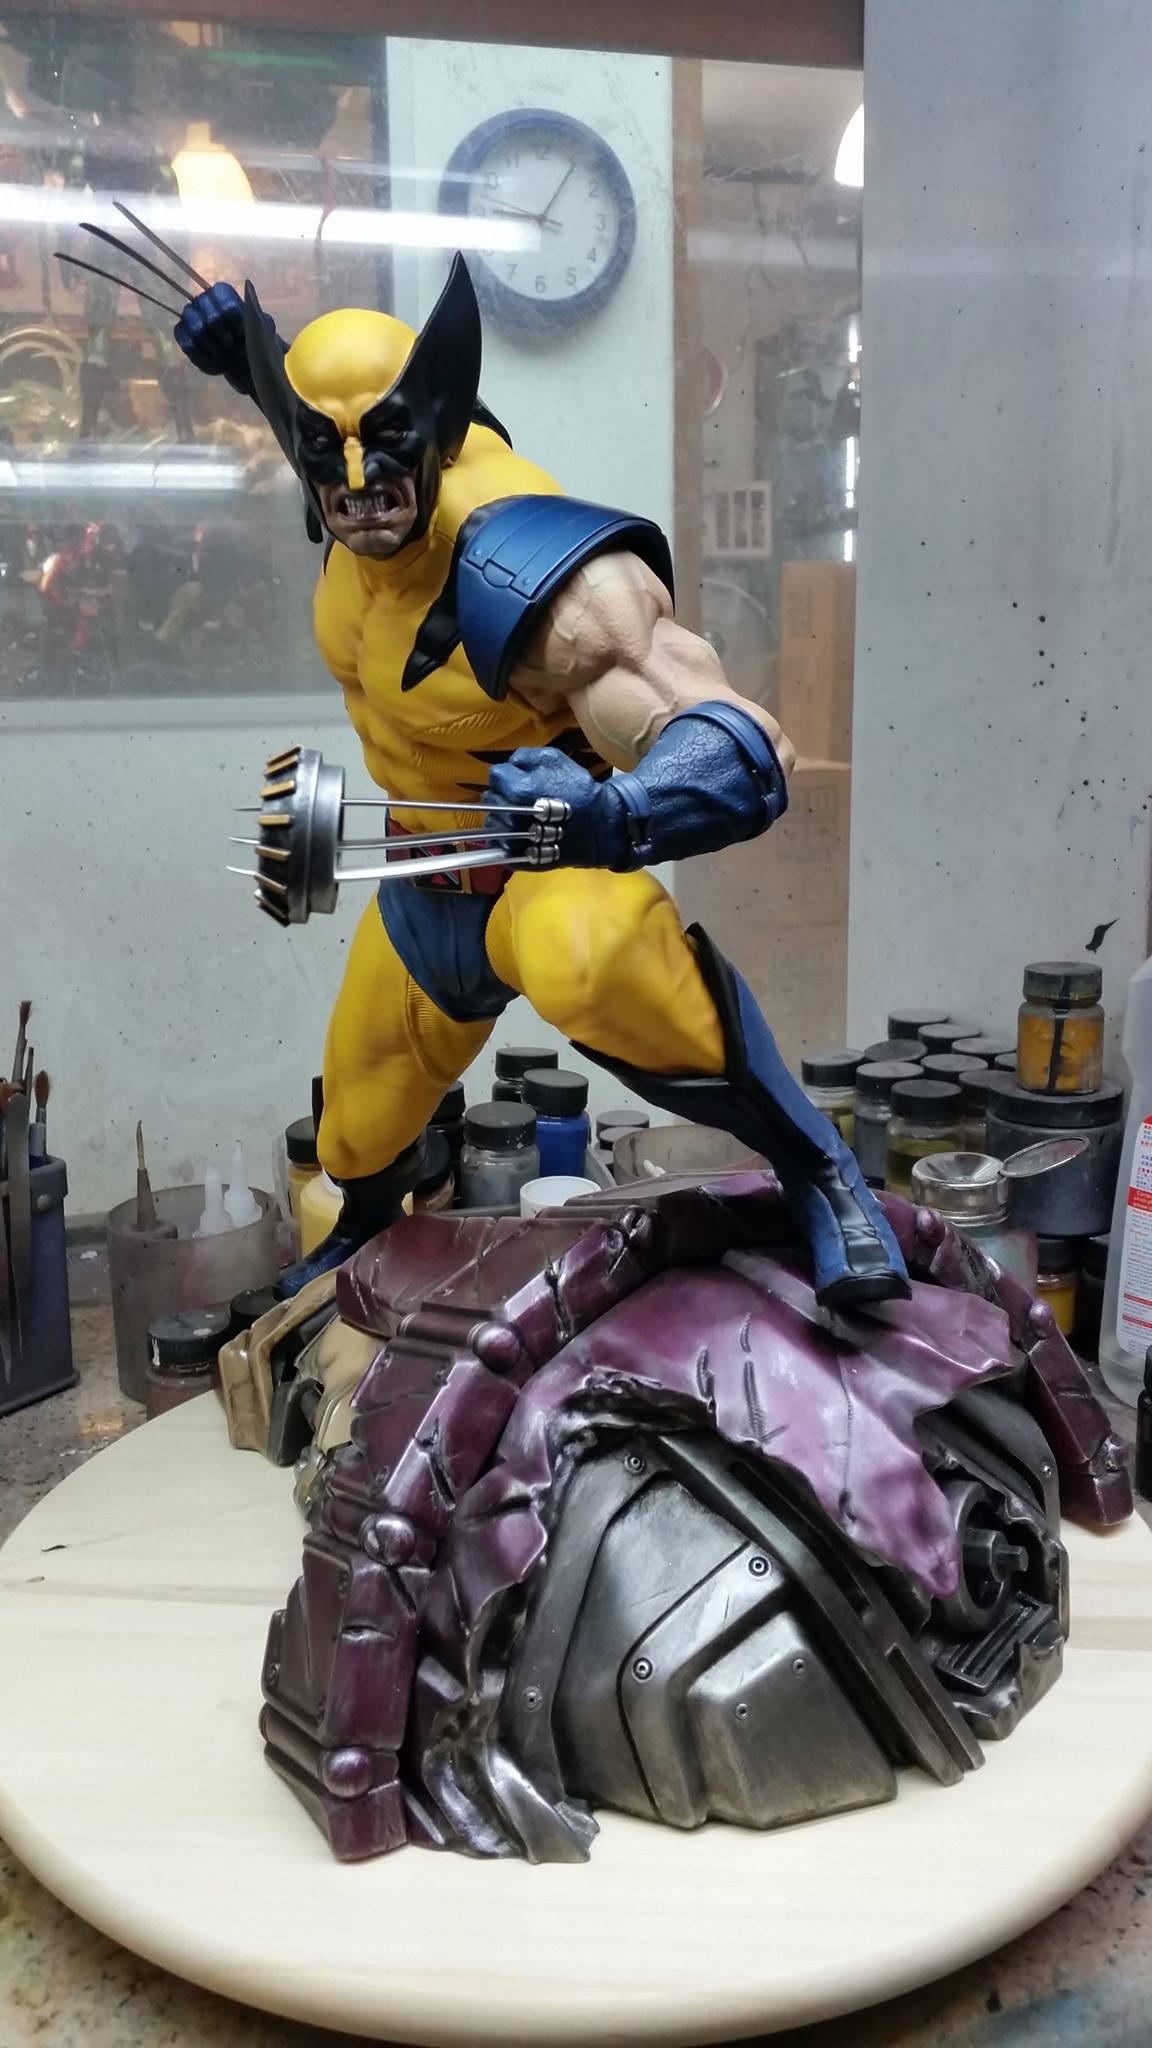 Premium Collectibles : Wolverine - Comics Version - Page 2 934796105116641417109051843123994807946919196695o